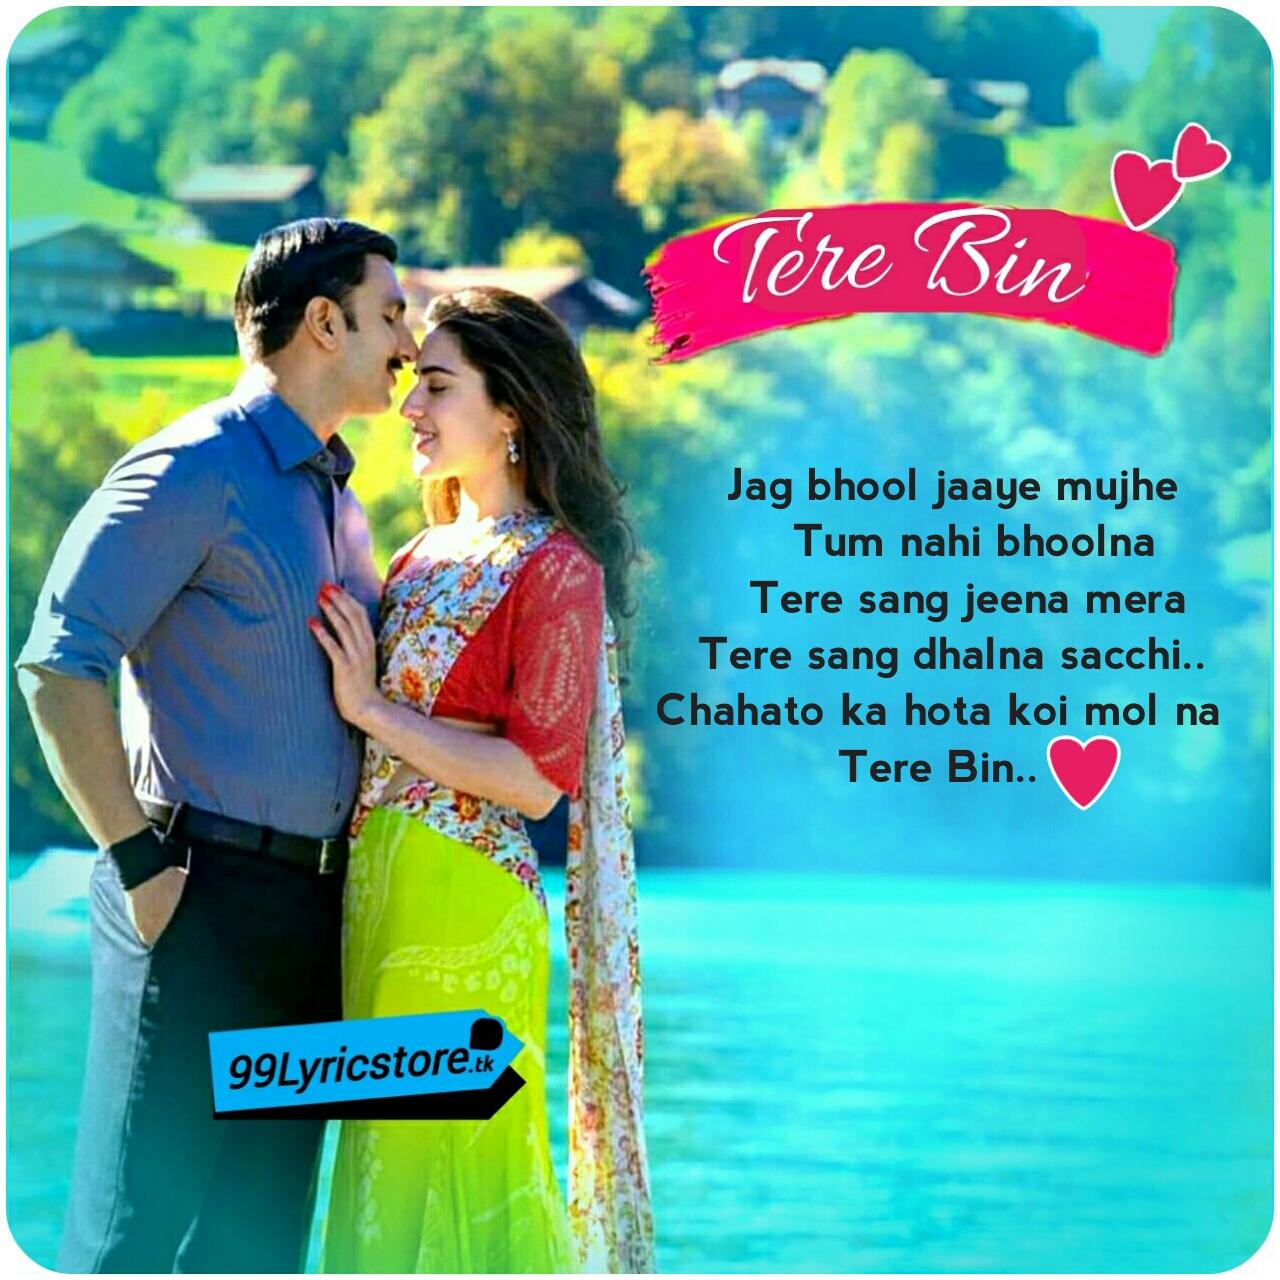 Simmba Movie Song Lyrics , Sara Ali Khan Song, Sara Ali Khan Images, Sara Ali Khan Song Lyrics 2018,Rahat Fateh Ali Khan Song, Rahat Fateh Ali Khan Song Lyrics